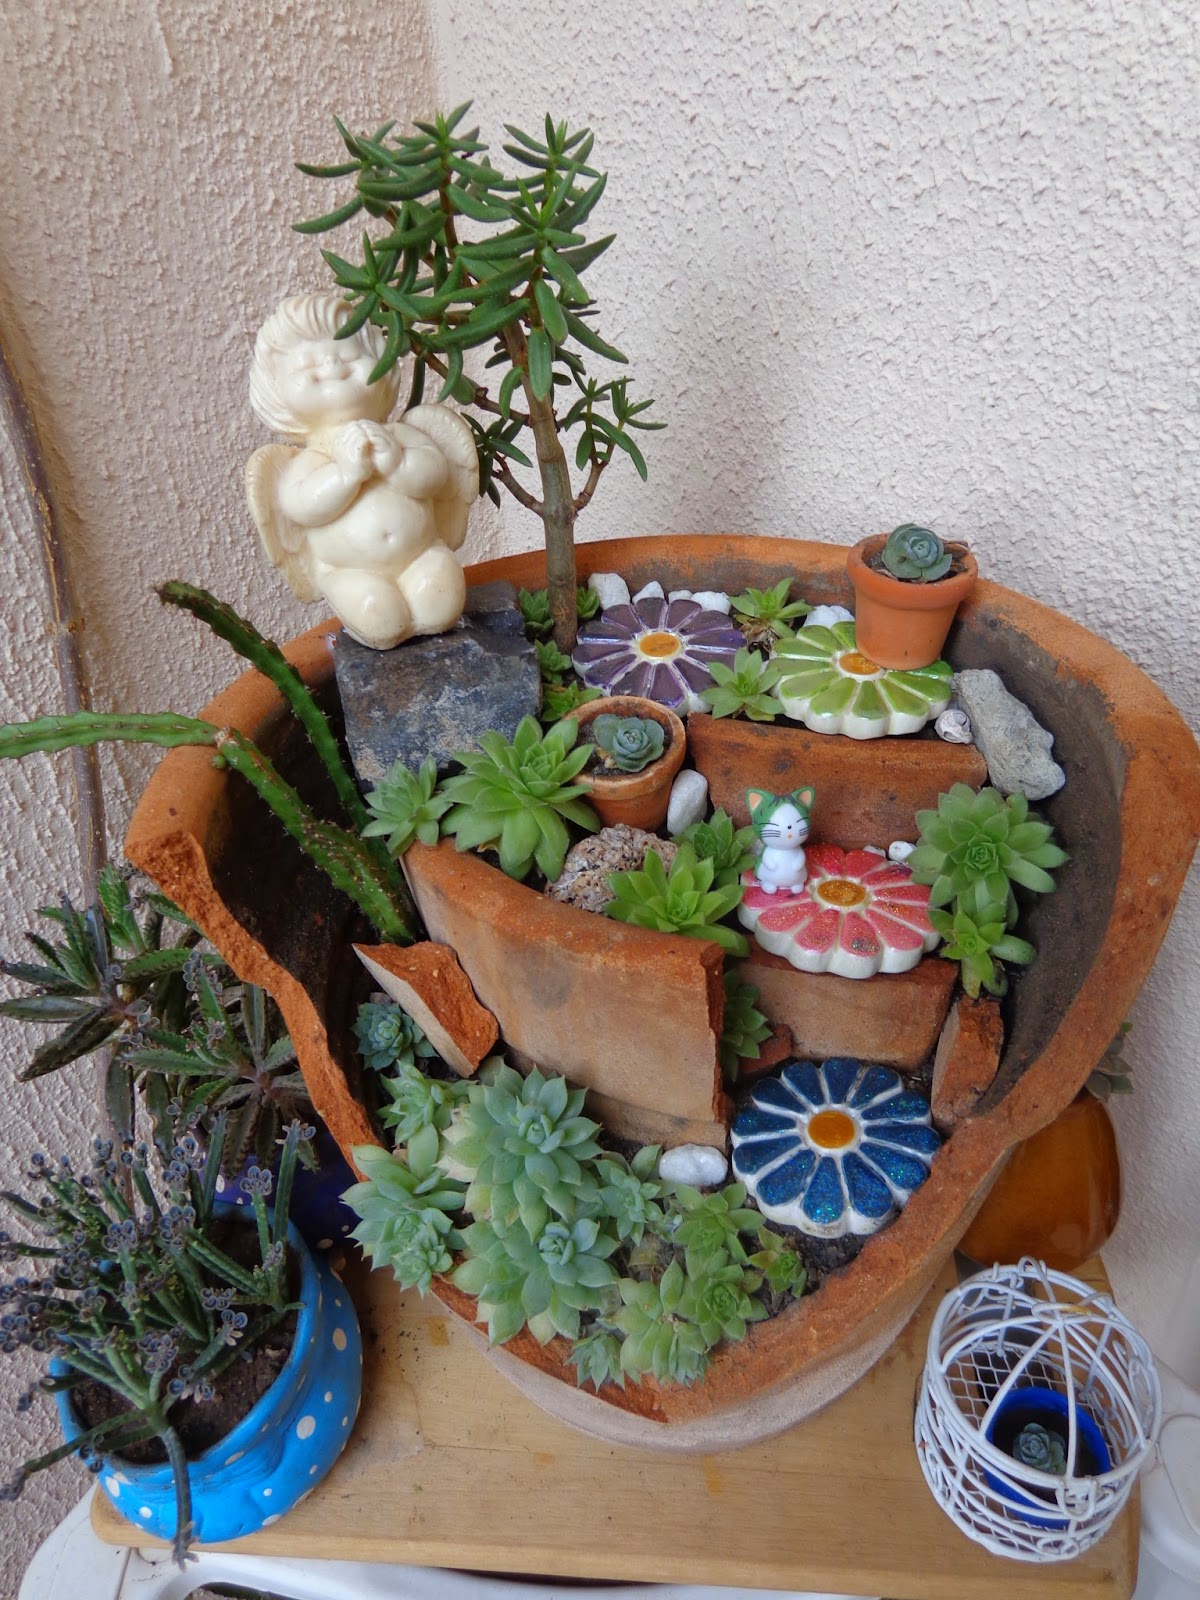 mini jardim cactos suculentas : mini jardim cactos suculentas:Mini-jardim com vaso quebrado: muito amor